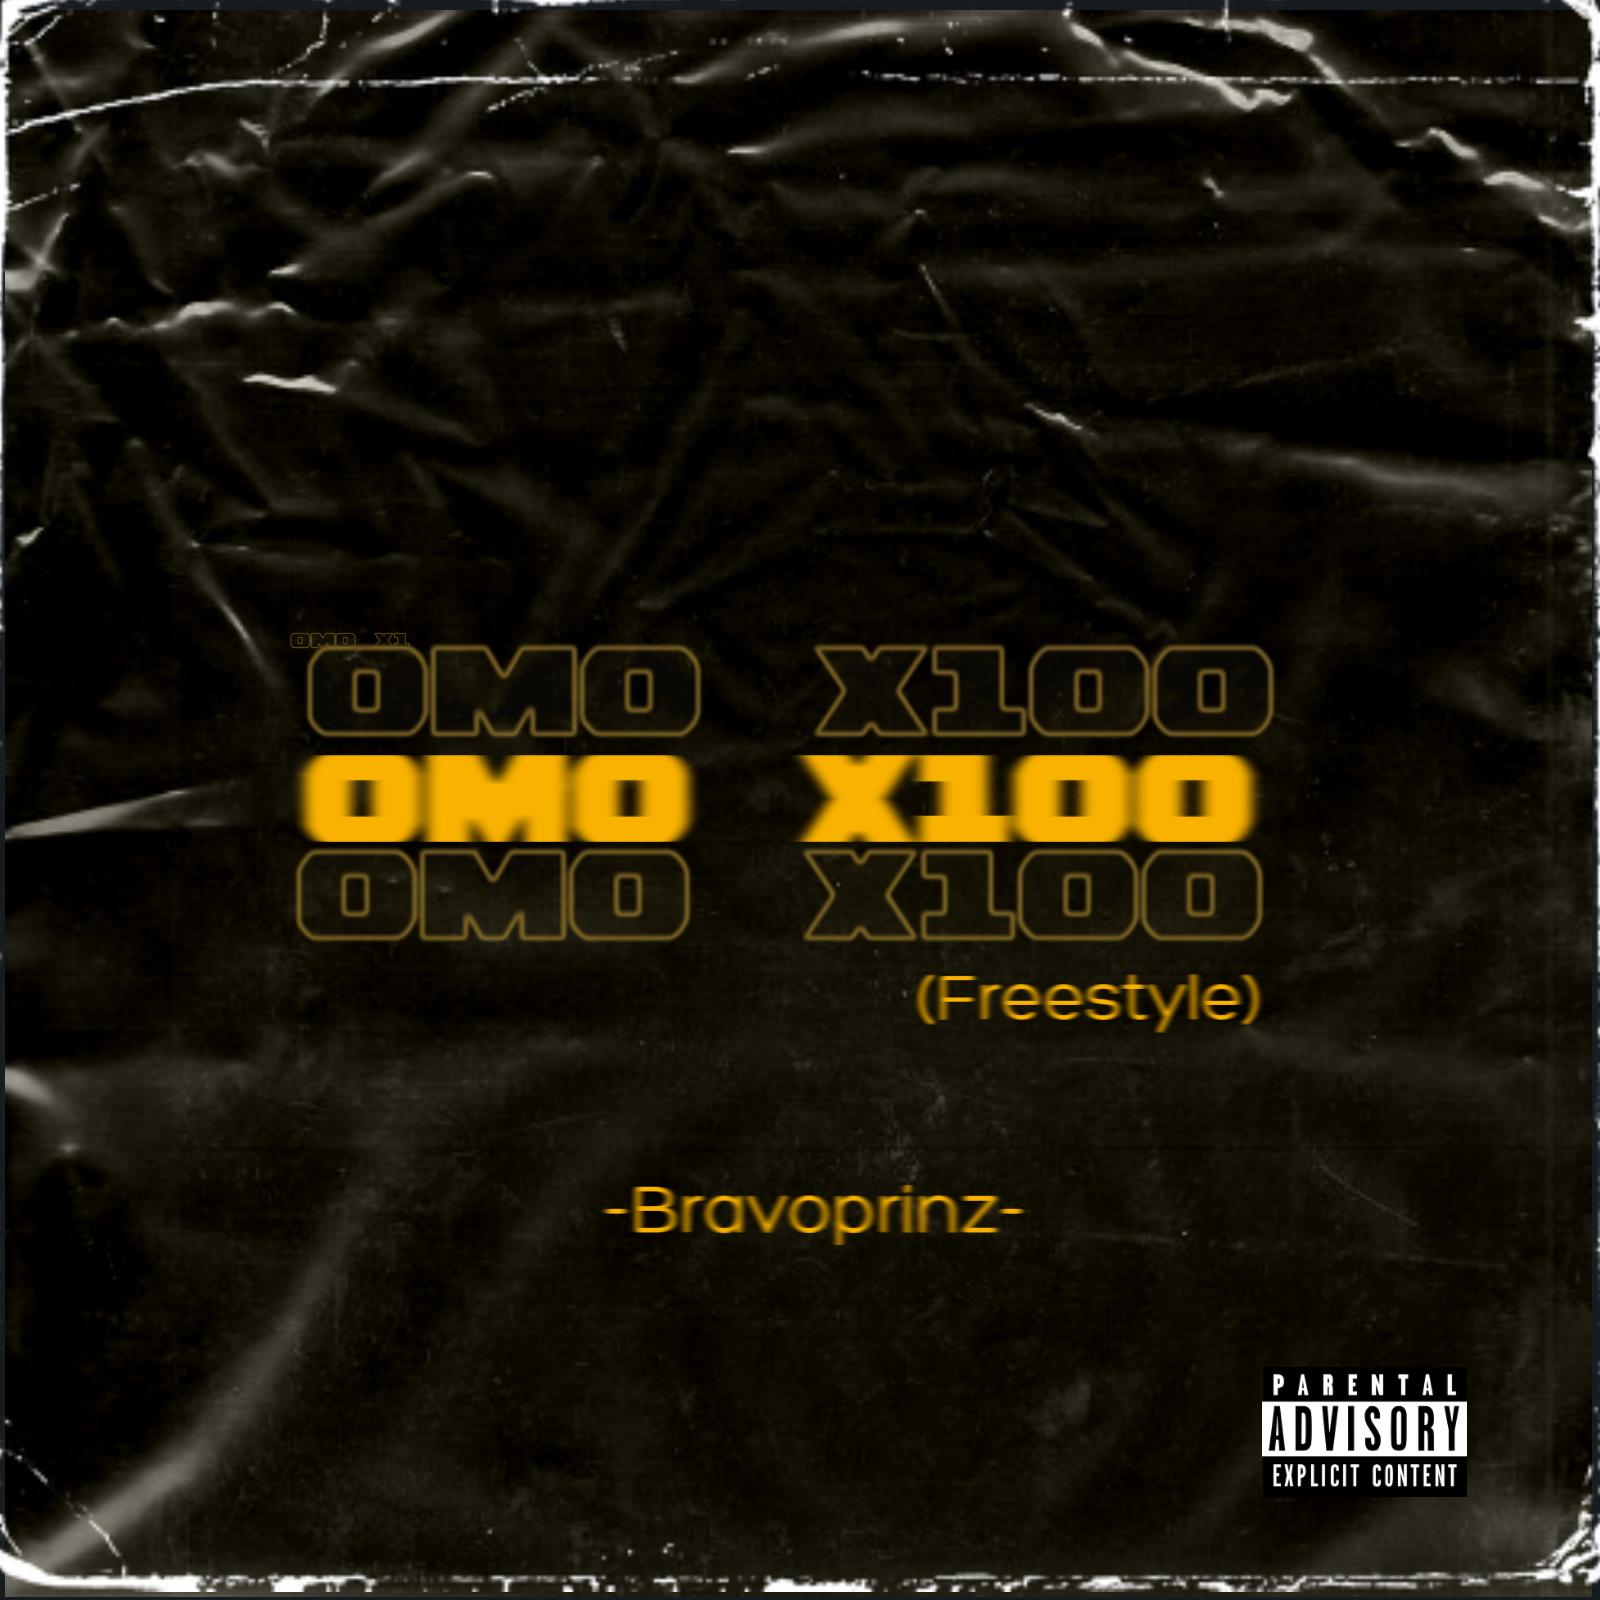 Bravoprinz - OMO X 100 Freestyle Feat. Olamide & Reminisce 1